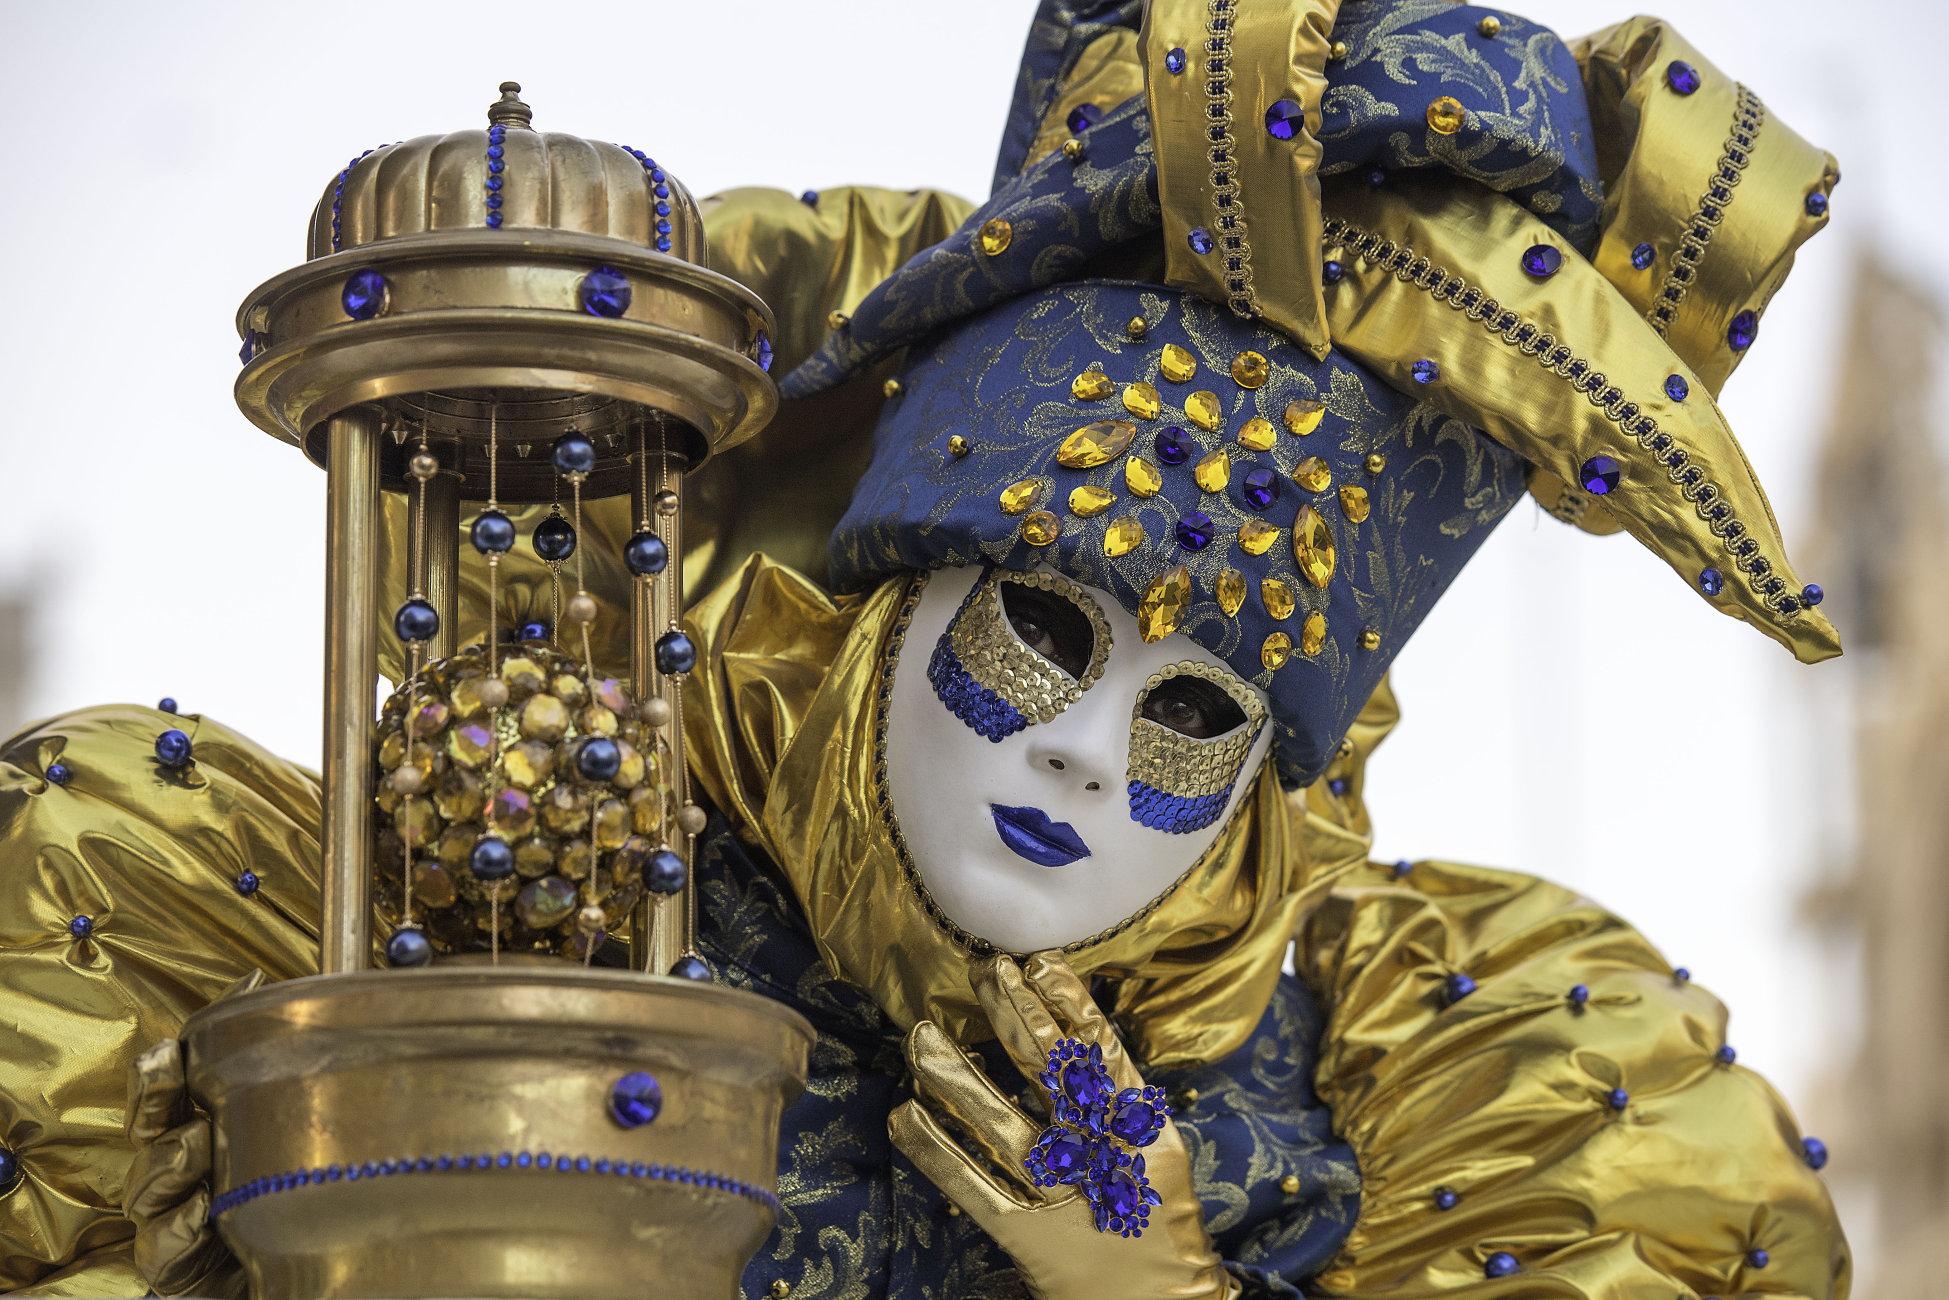 Venice Carnival 2020 - Part 3